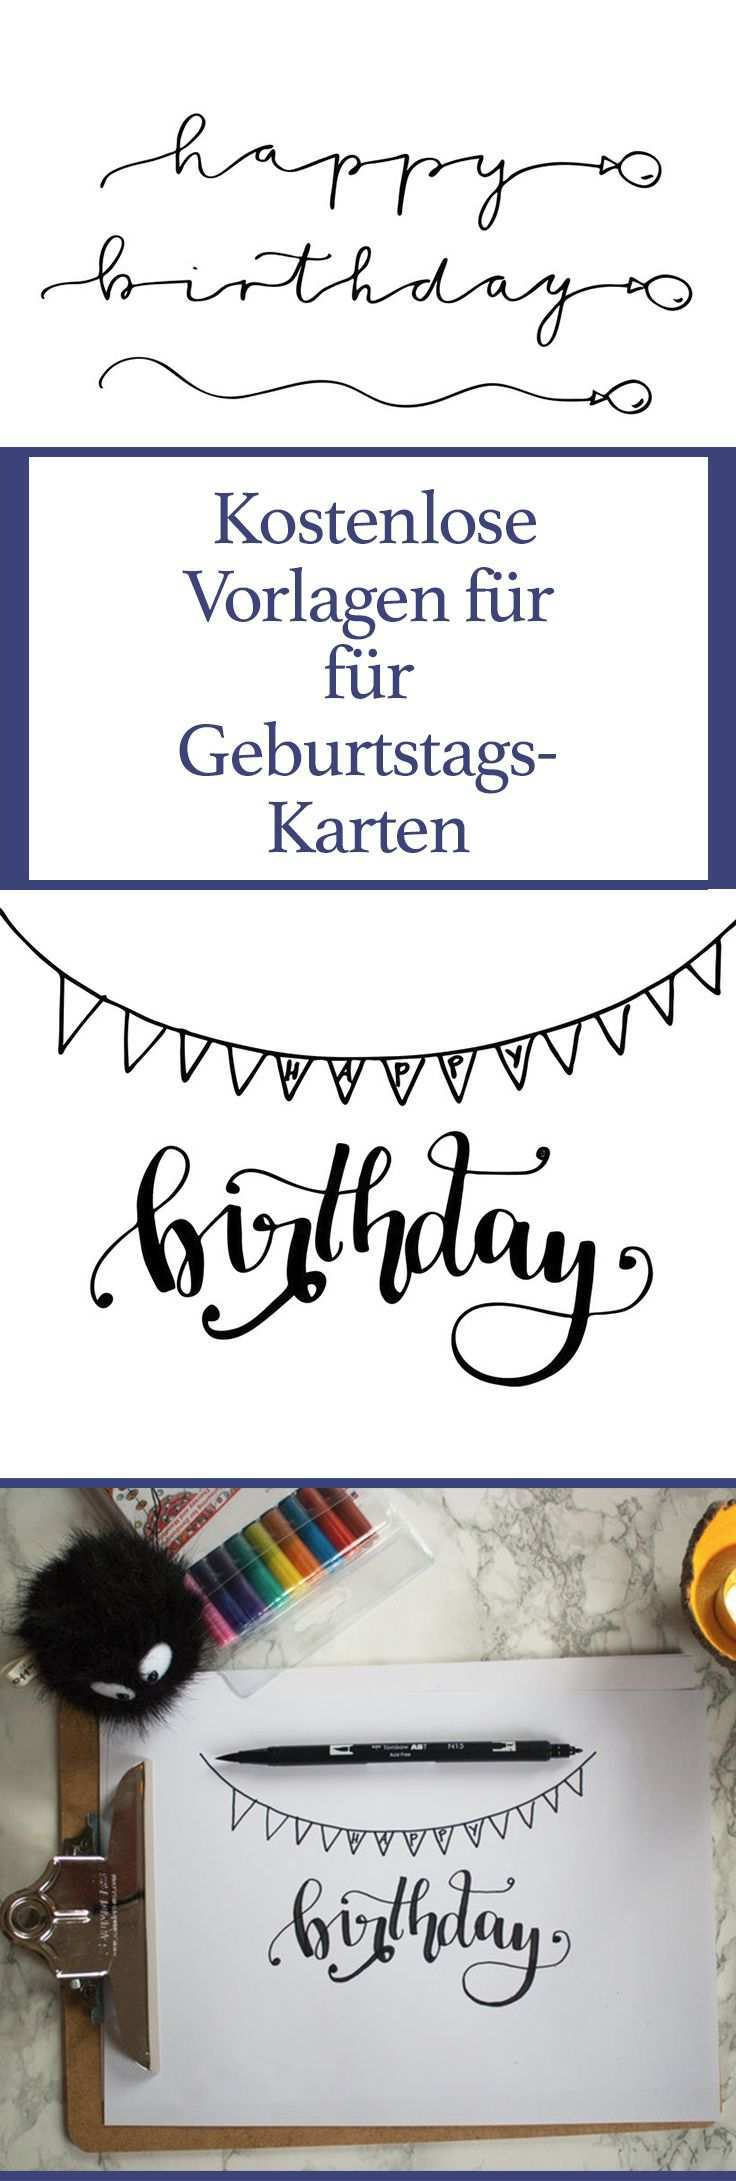 Pin Auf Geburtstags Karten Ideen Mit Handlettering